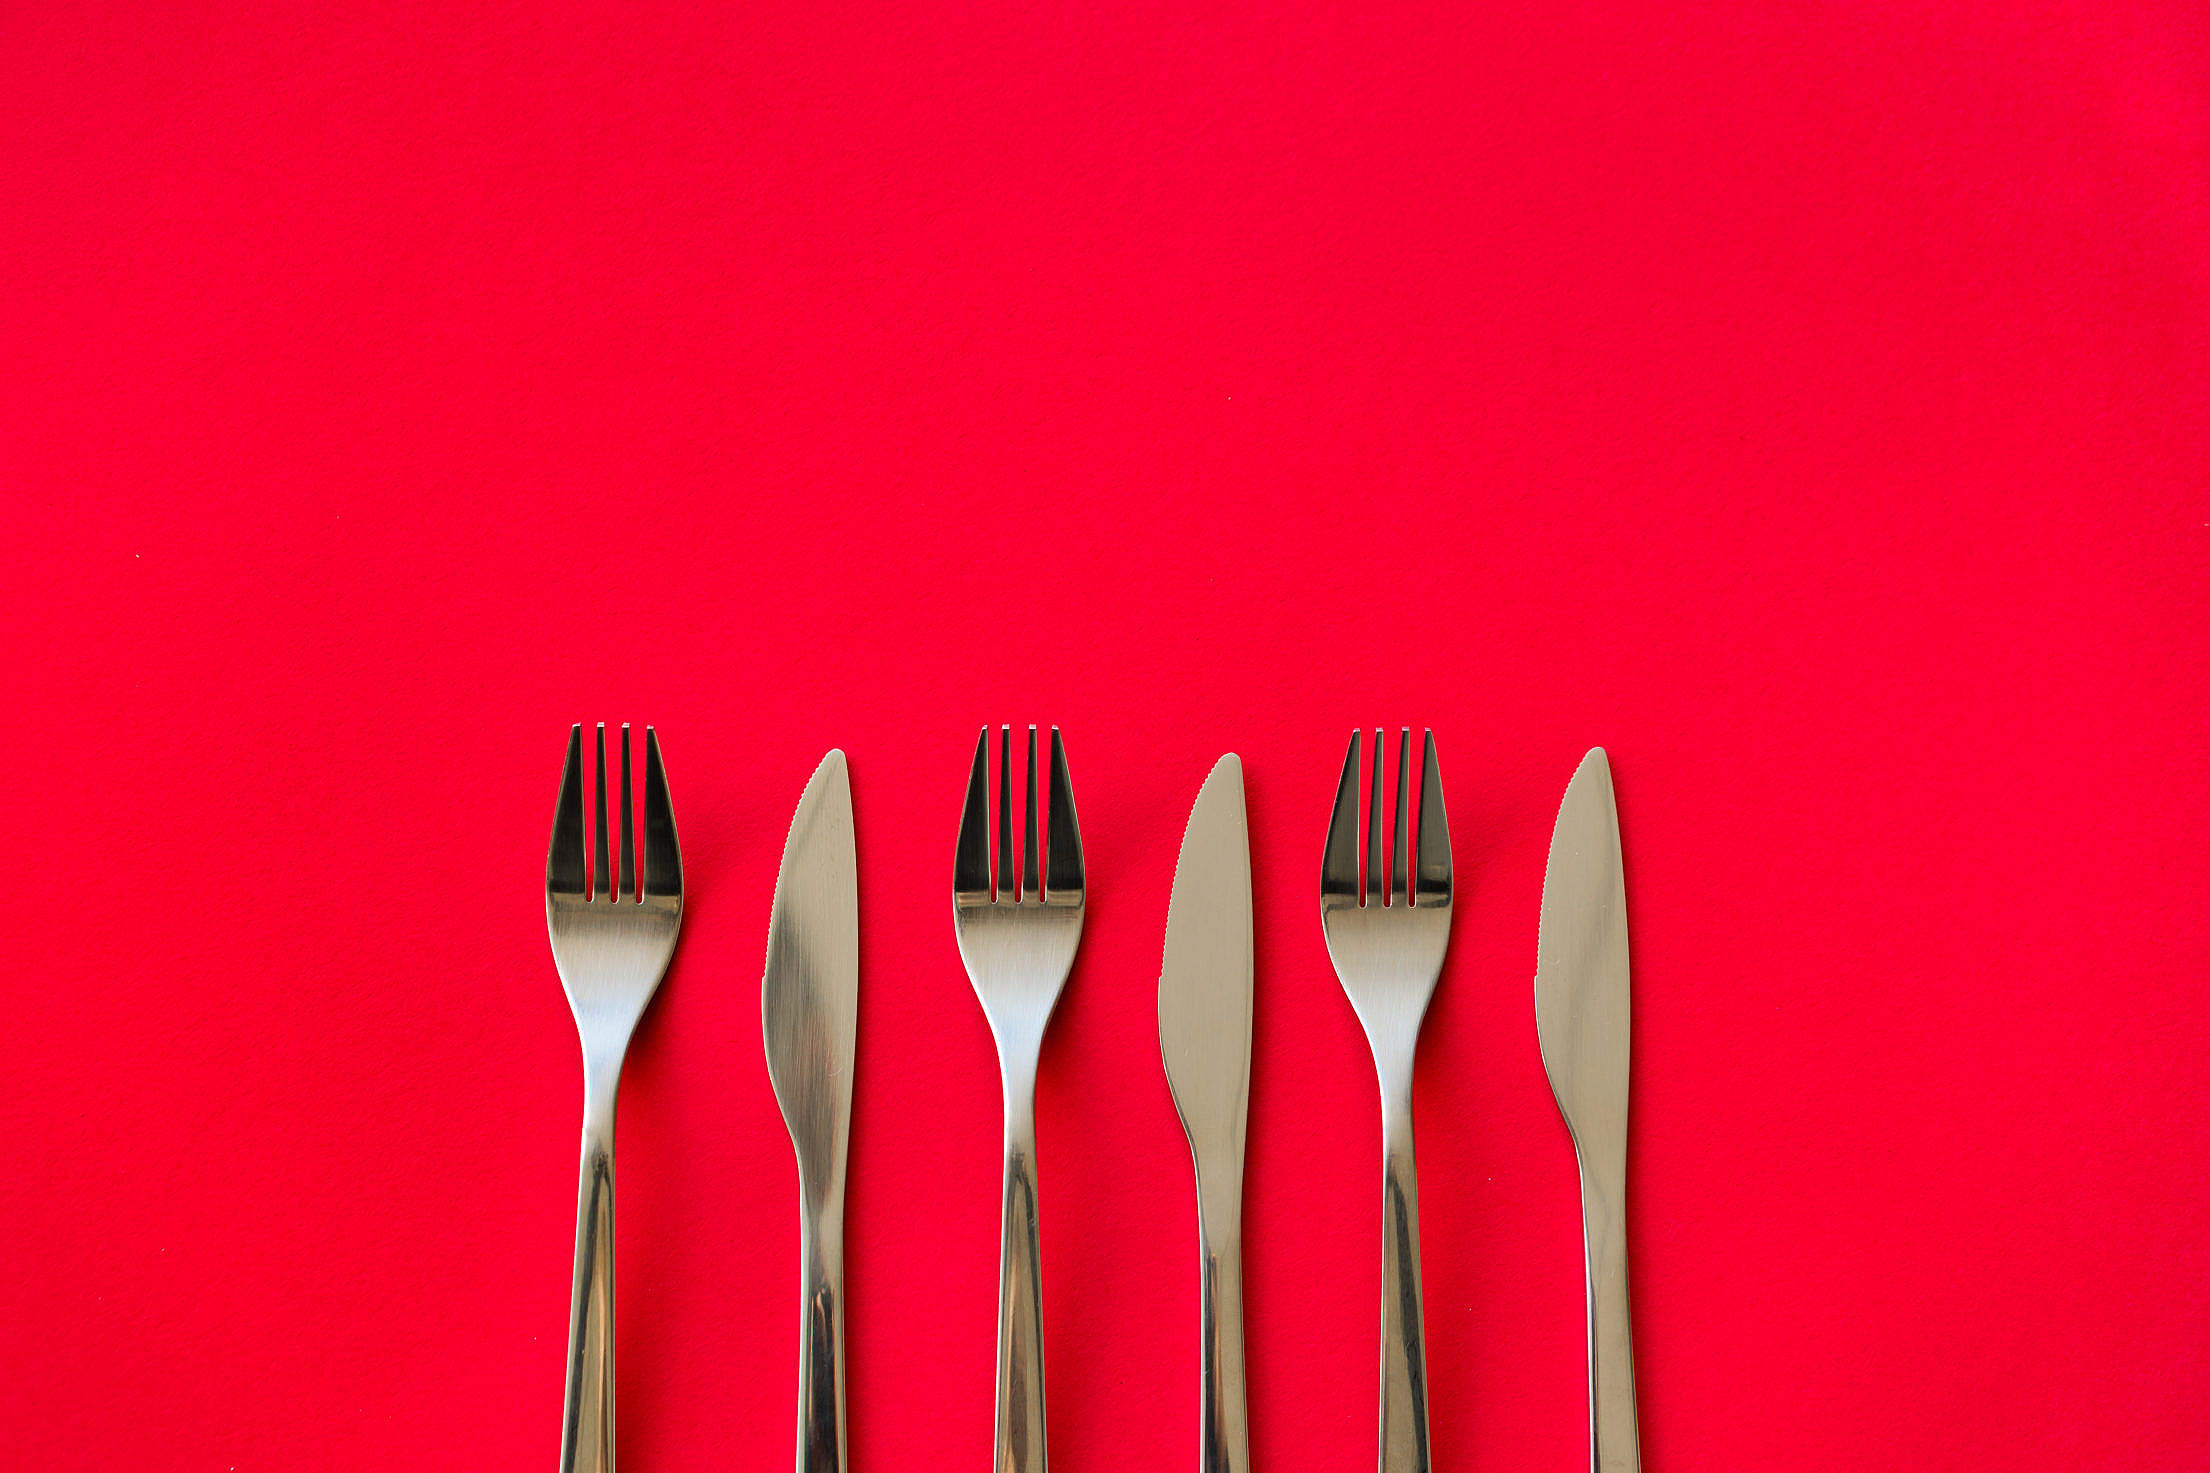 Cutlery Free Stock Photo